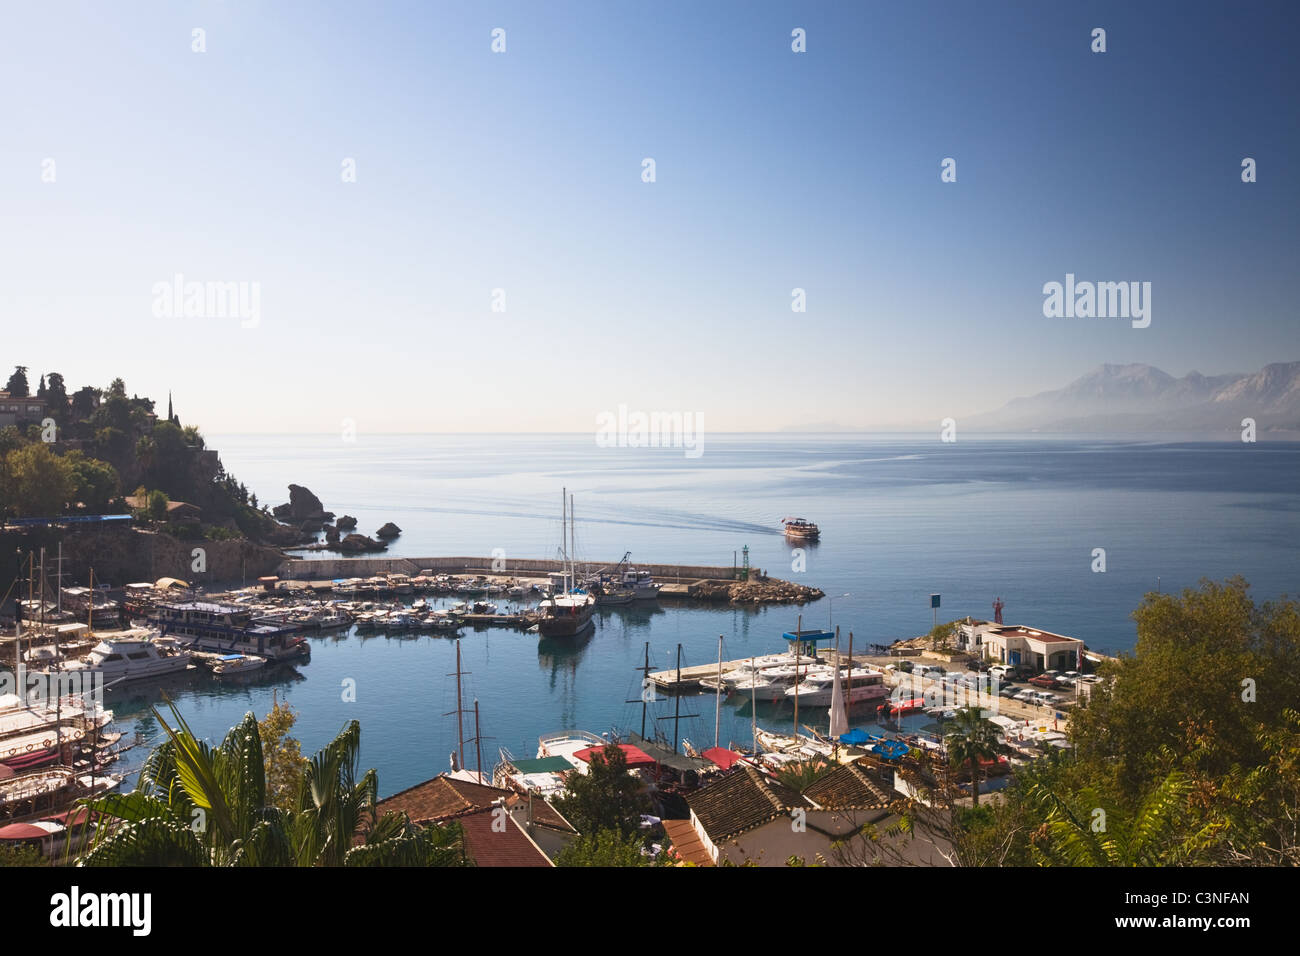 Turkey, Antalya, marina and rooftops of Old Town - Stock Image